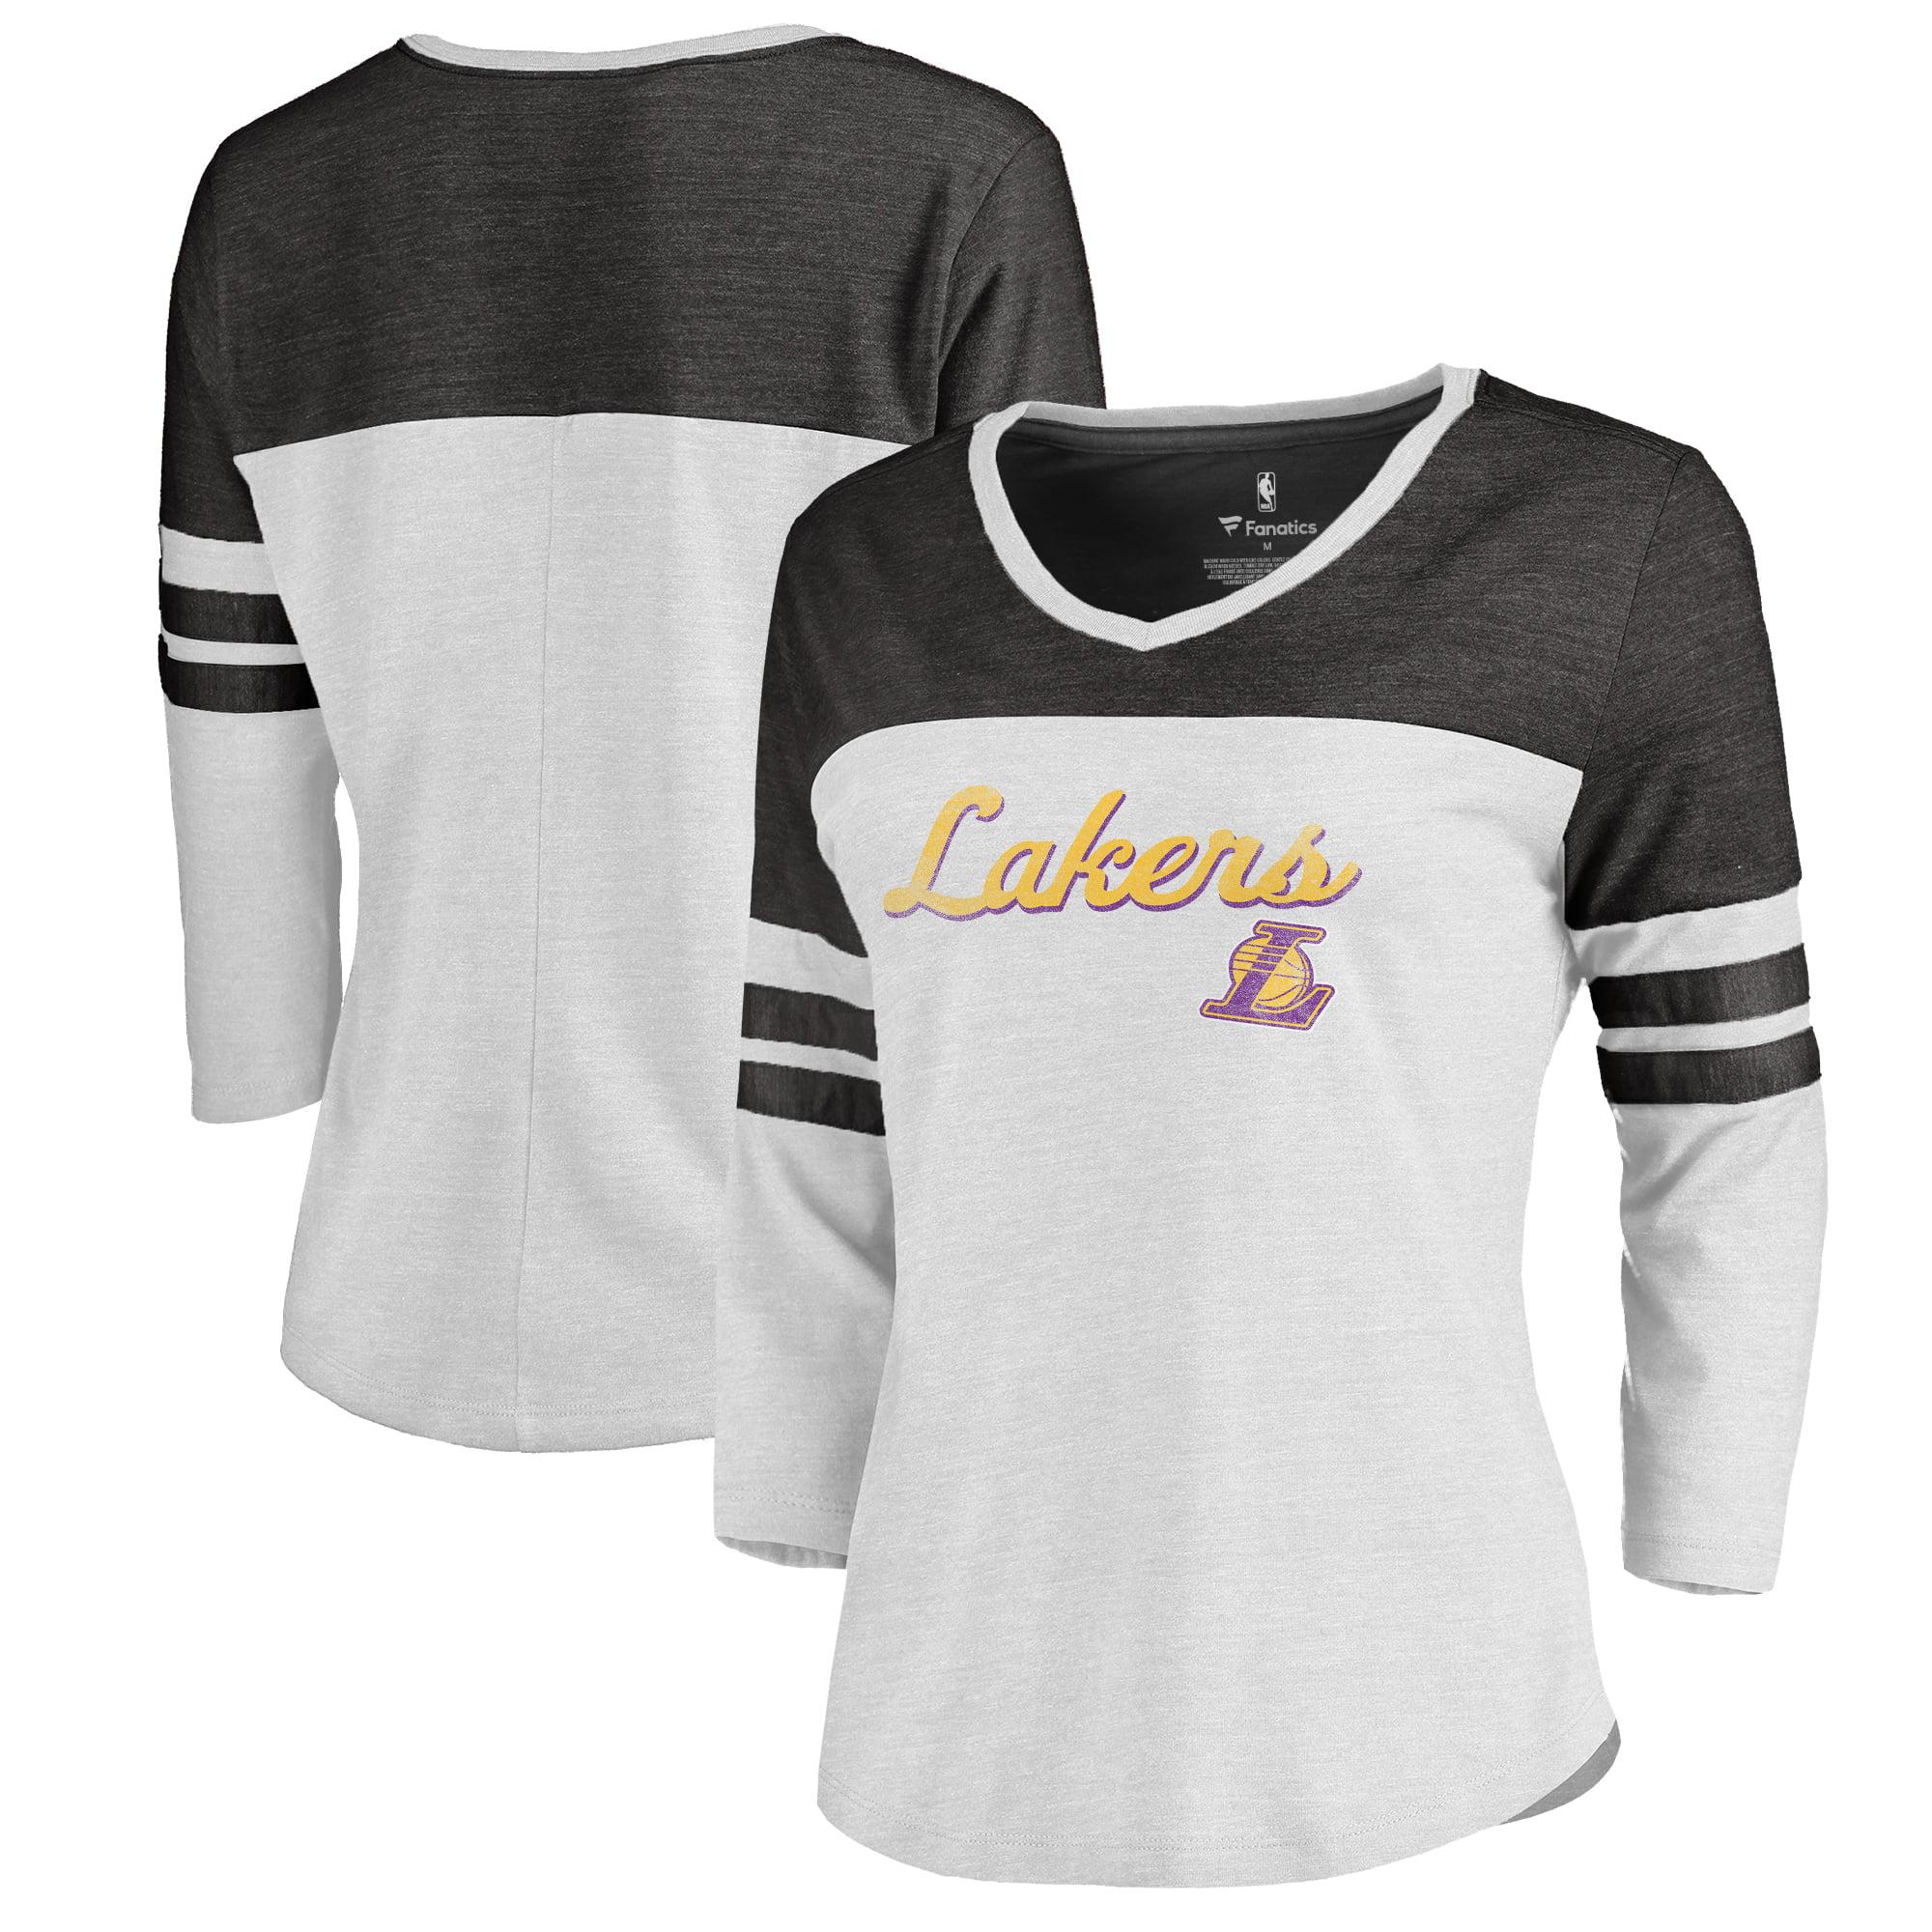 Los Angeles Lakers Fanatics Branded Women's Rising Script Plus Size Color Block 3/4 Sleeve Tri-Blend T-Shirt - White